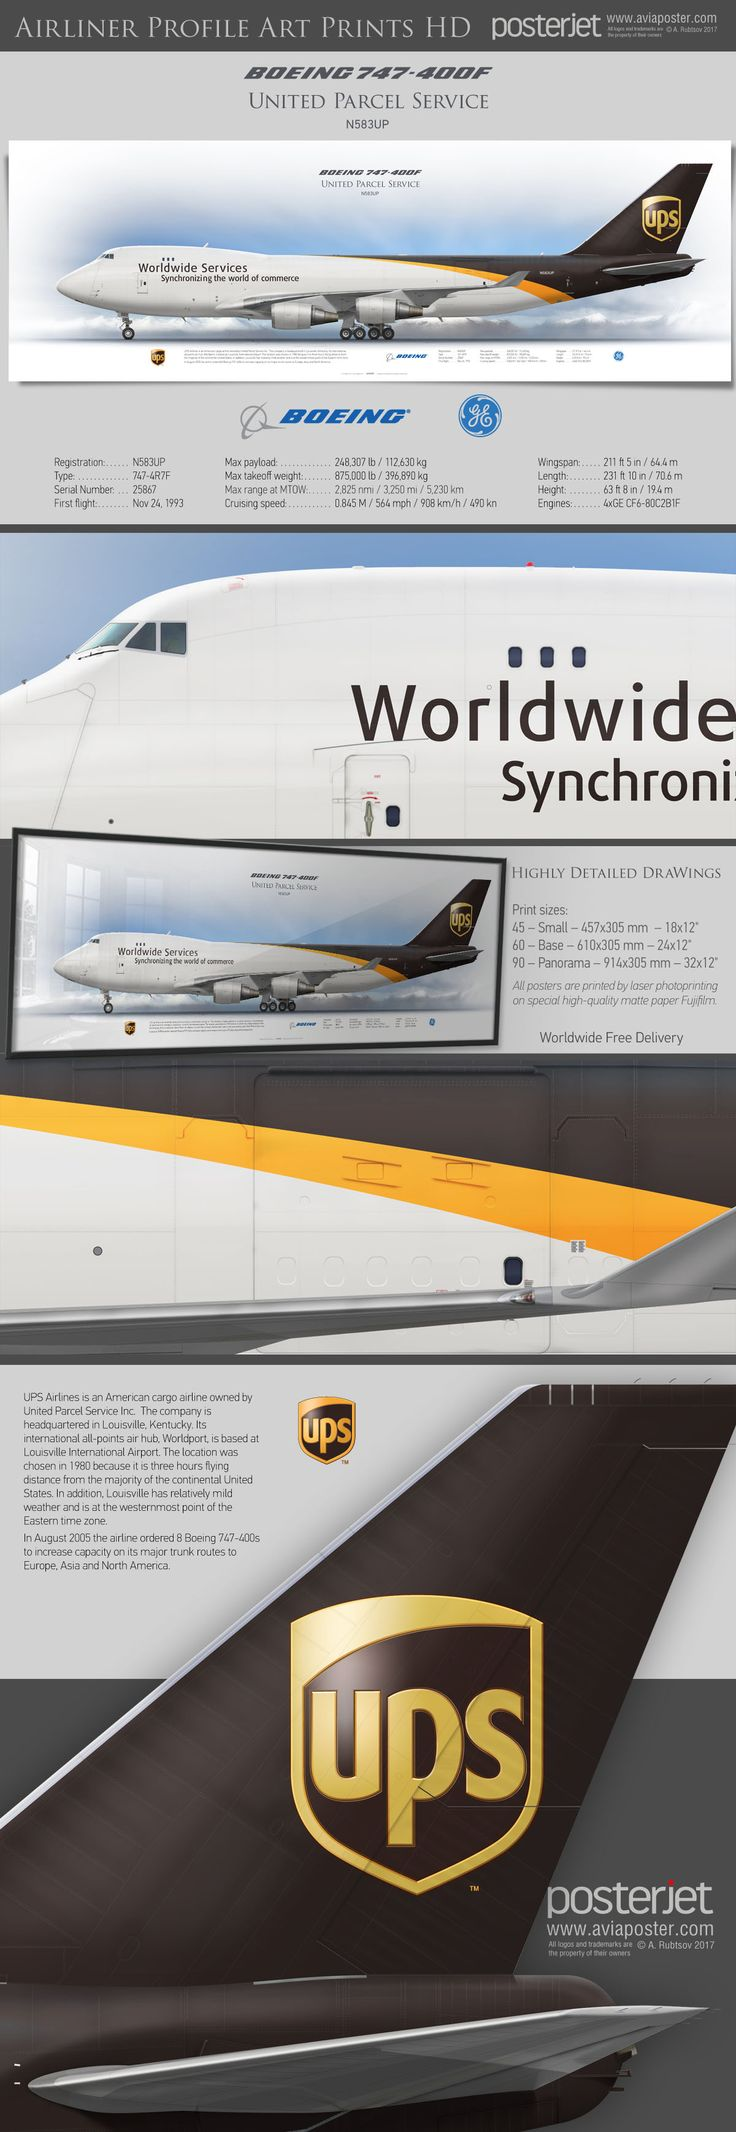 Boeing 747-400f UPS Airlines N583UP   www.aviaposter.com   #airliners #aviation #jetliner #airplane #pilot #aviationlovers #avgeek #jet #airport #pilotlife #cabincrew #jumbojet